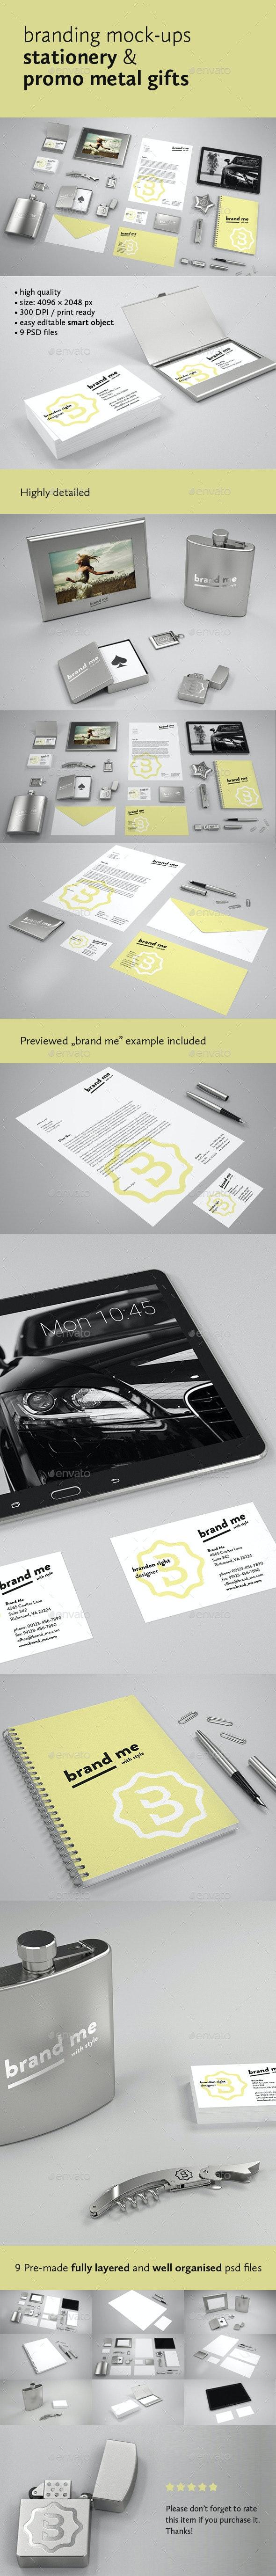 Branding Mock-ups Stationery & Promo Metal Gifts  - Stationery Print